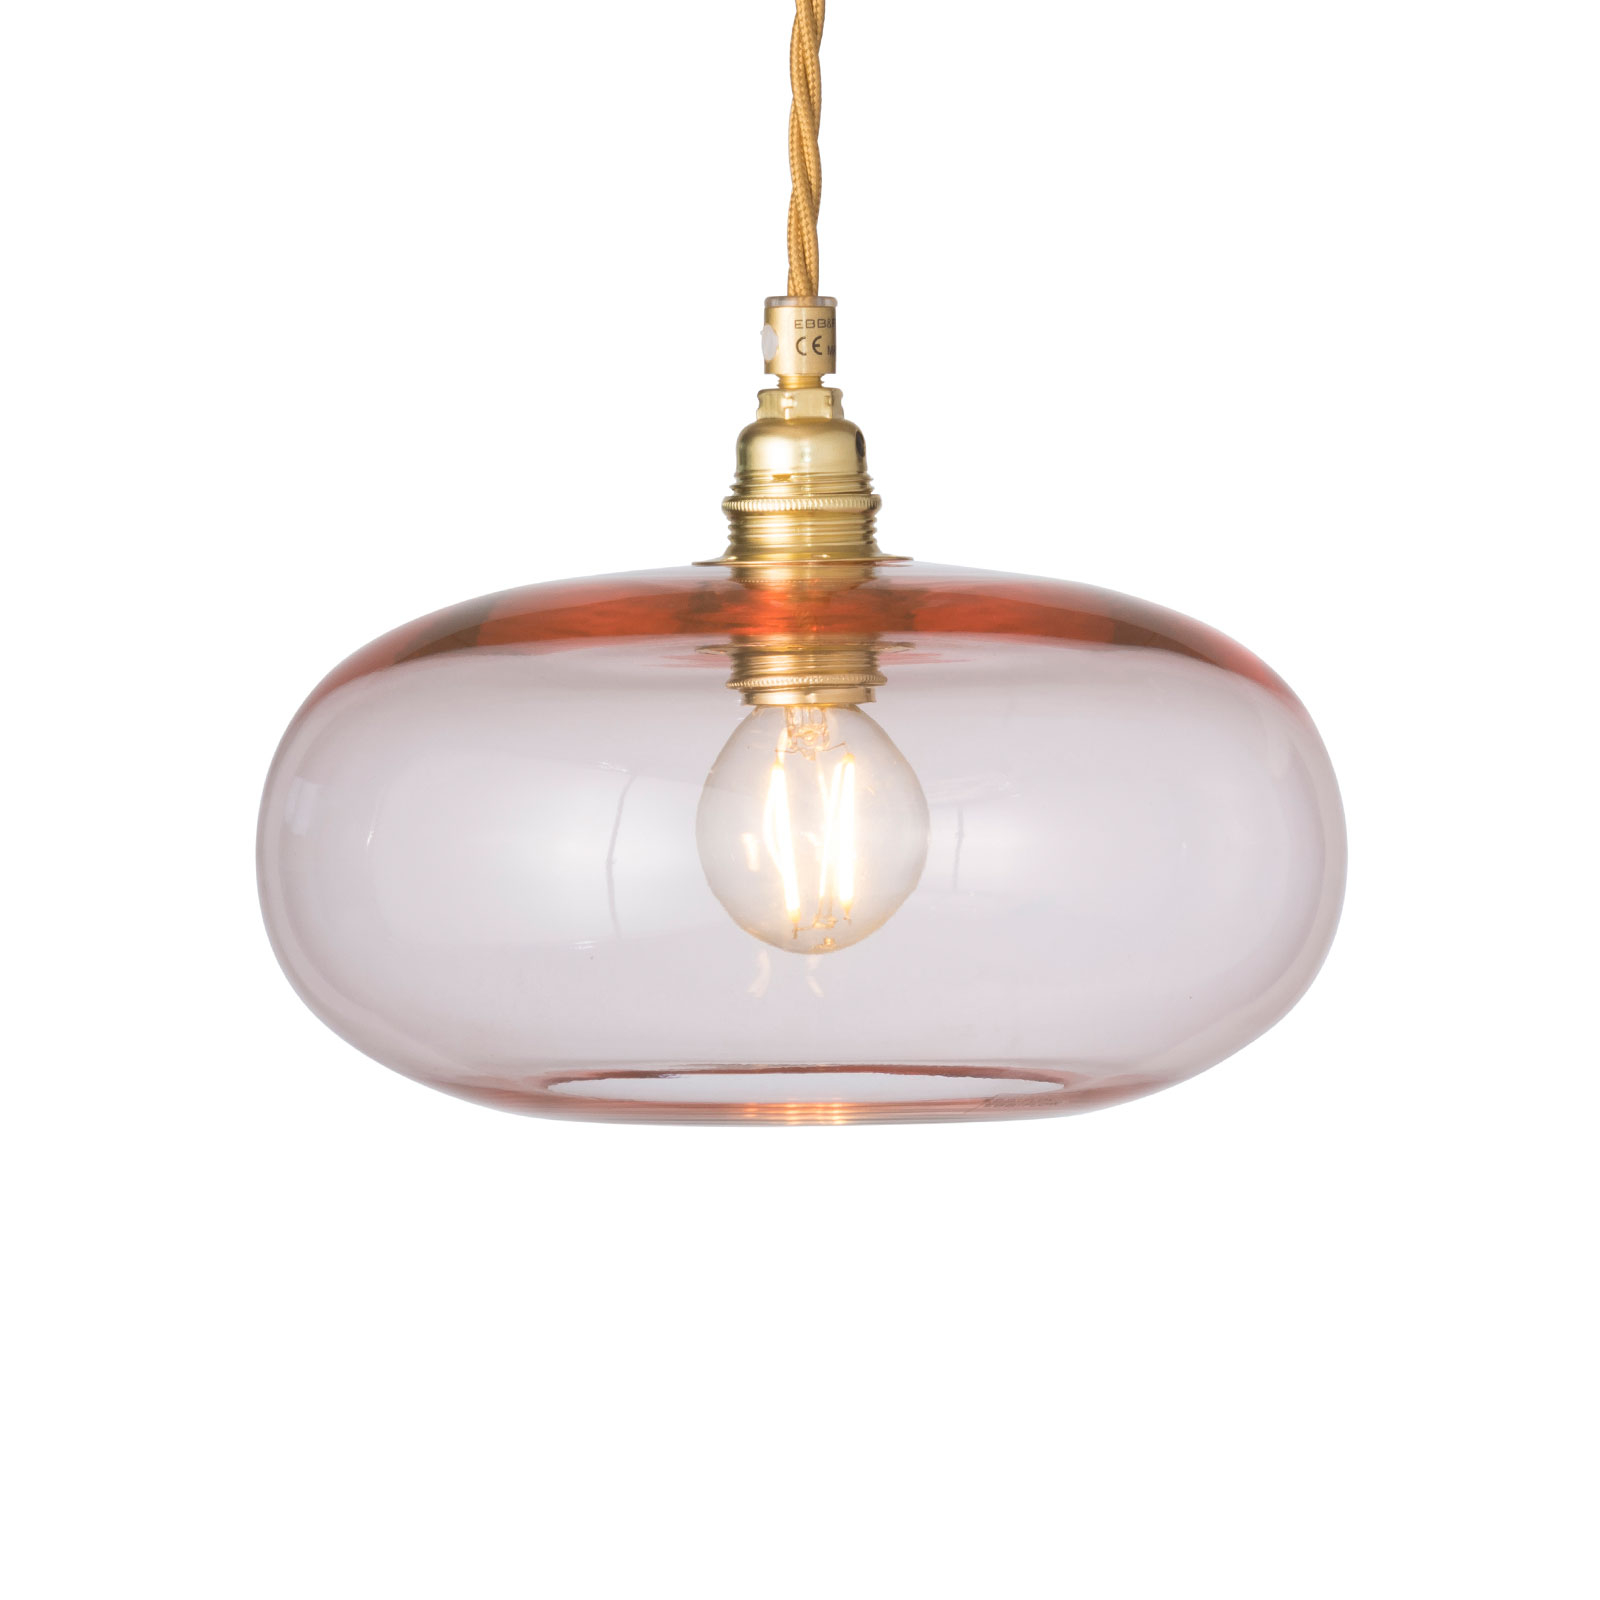 EBB & FLOW Horizon hanglamp rosé-goud Ø 21cm